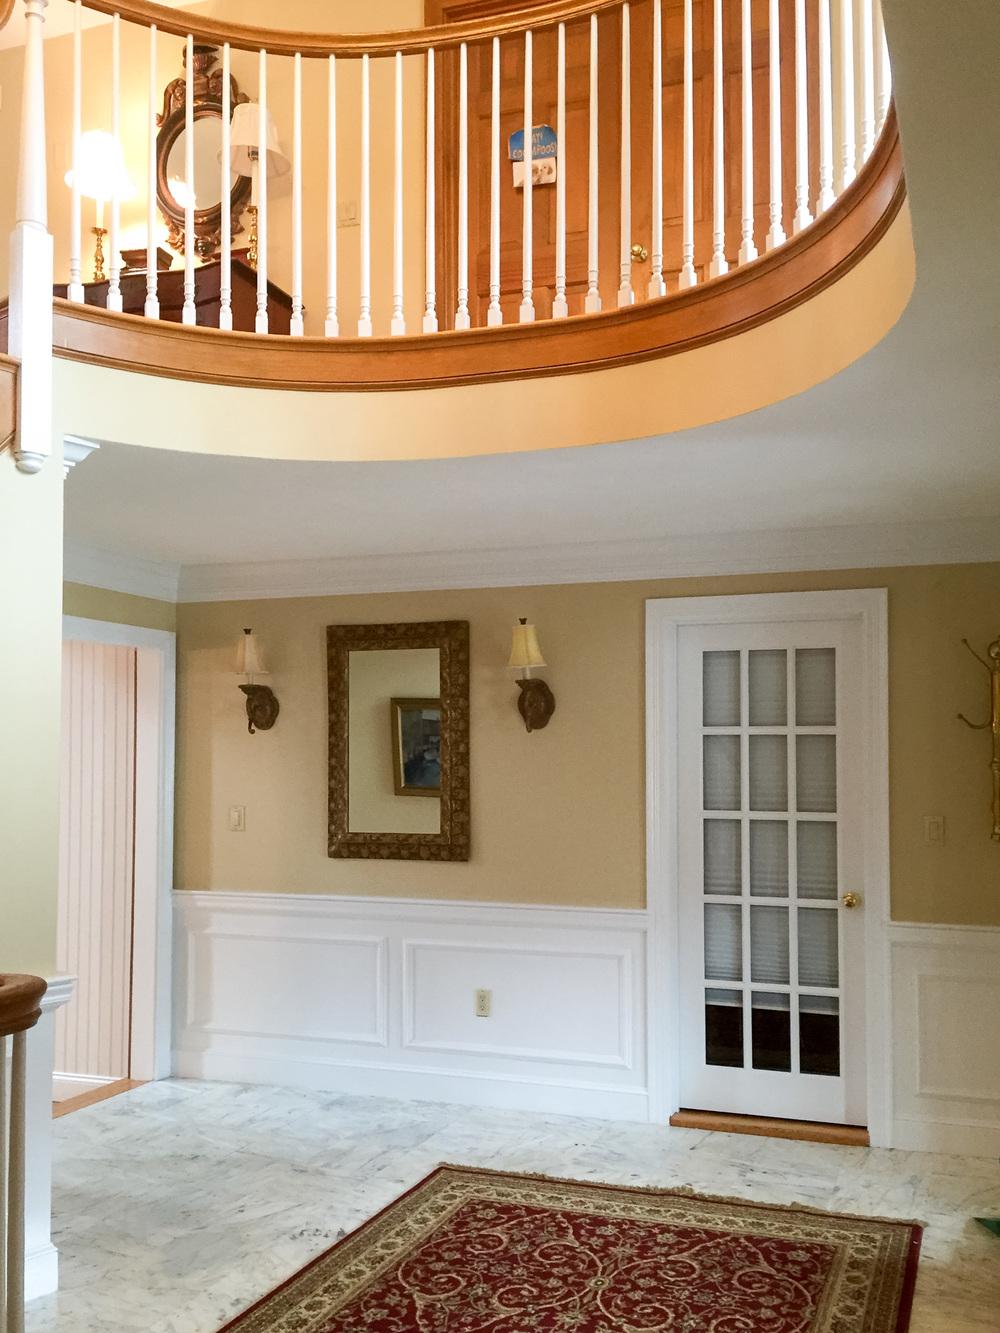 big-dog-painting-entry-way-railings.jpg